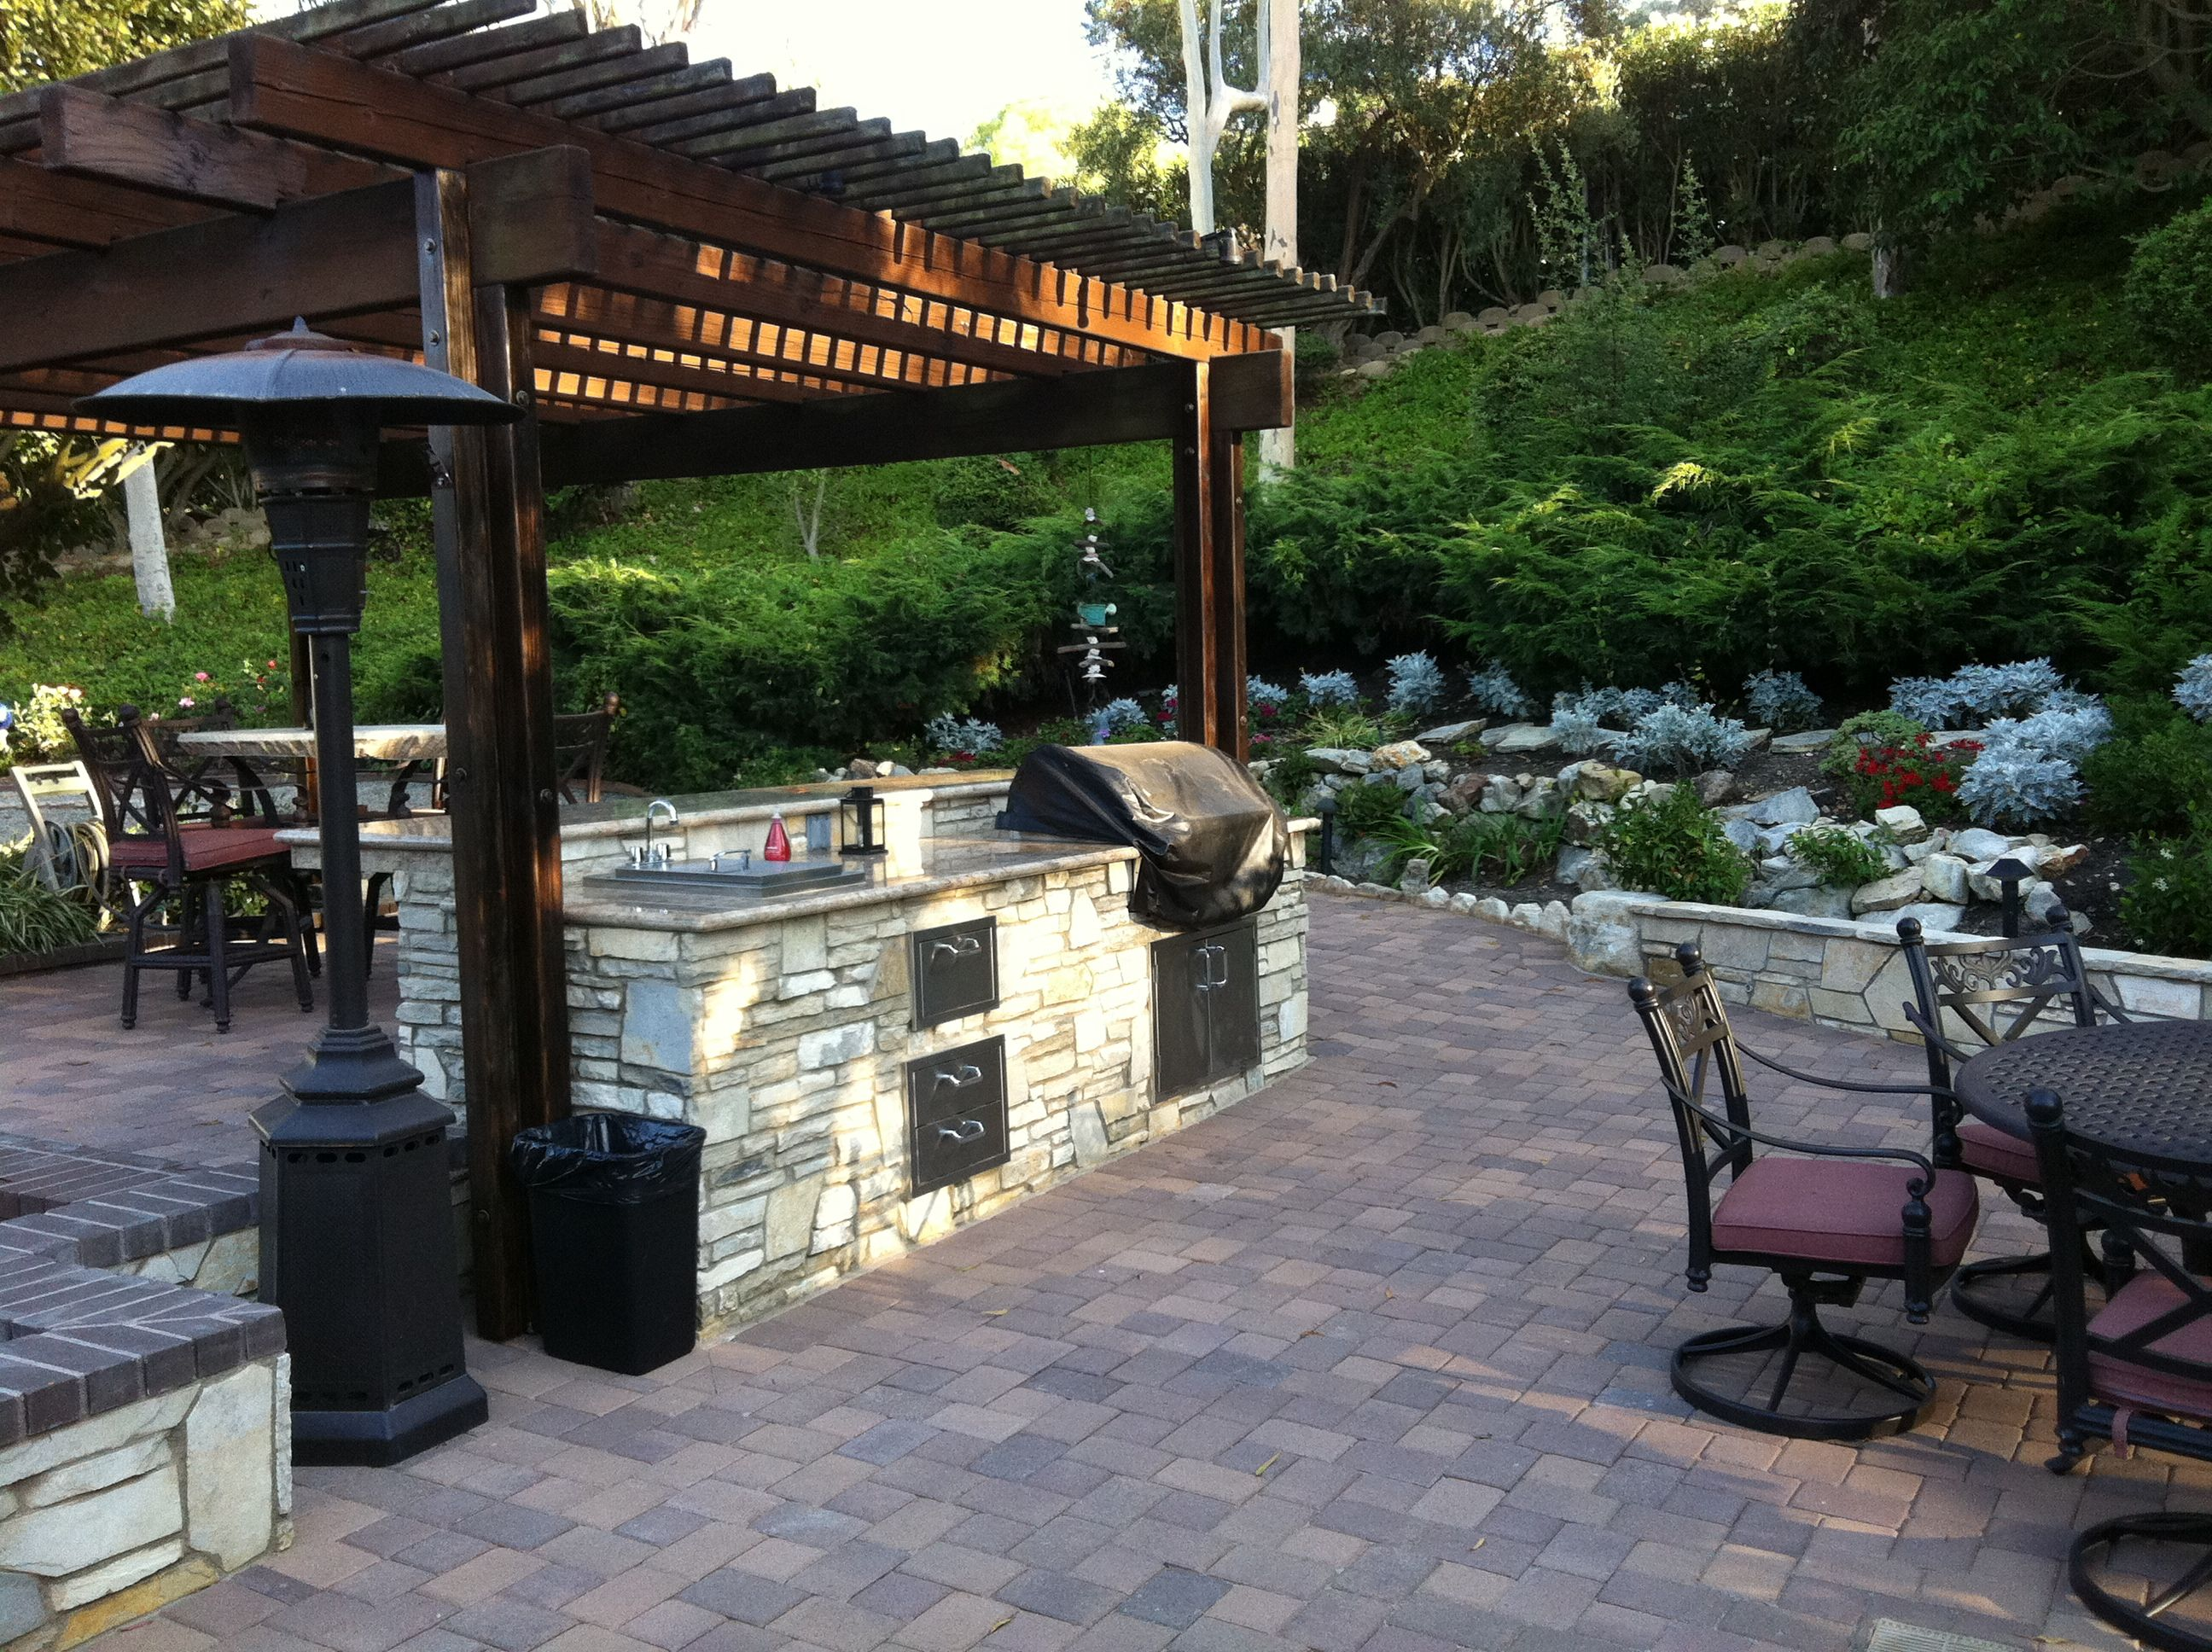 New patio, New BBQ island | Barbecue design, Patio ... on Backyard Patio Grill Island id=13046